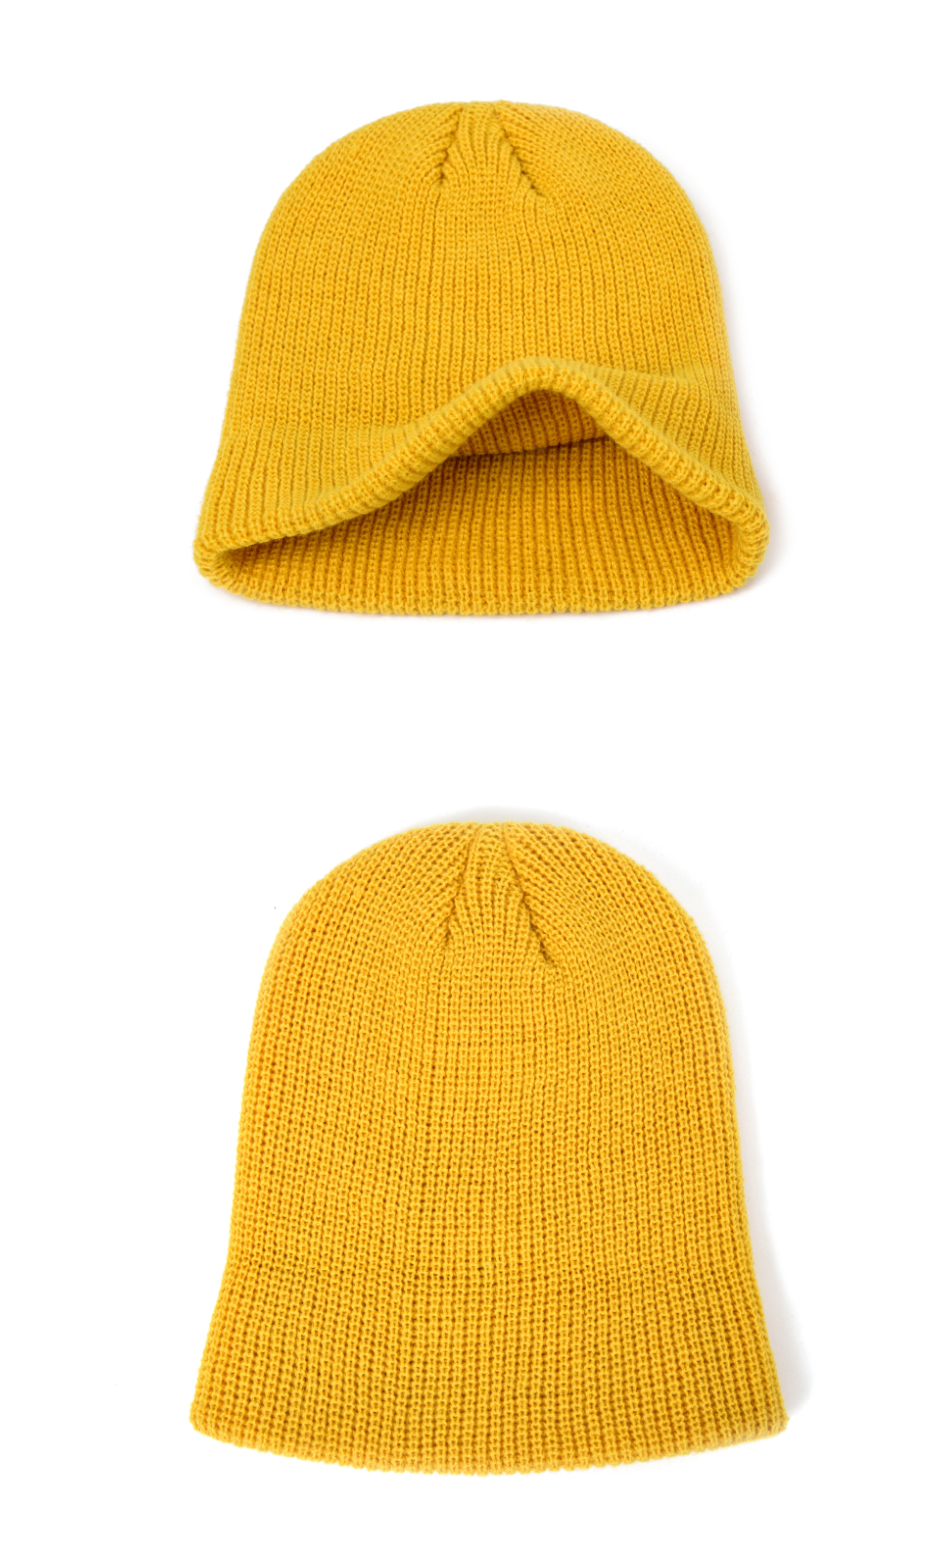 2019 Fashion Unisex Winter Hat Men Cuffed Cib Knit Hat Short Melon Ski Beanies Autumn Winter Solid Color Casual Beanie Hat 28